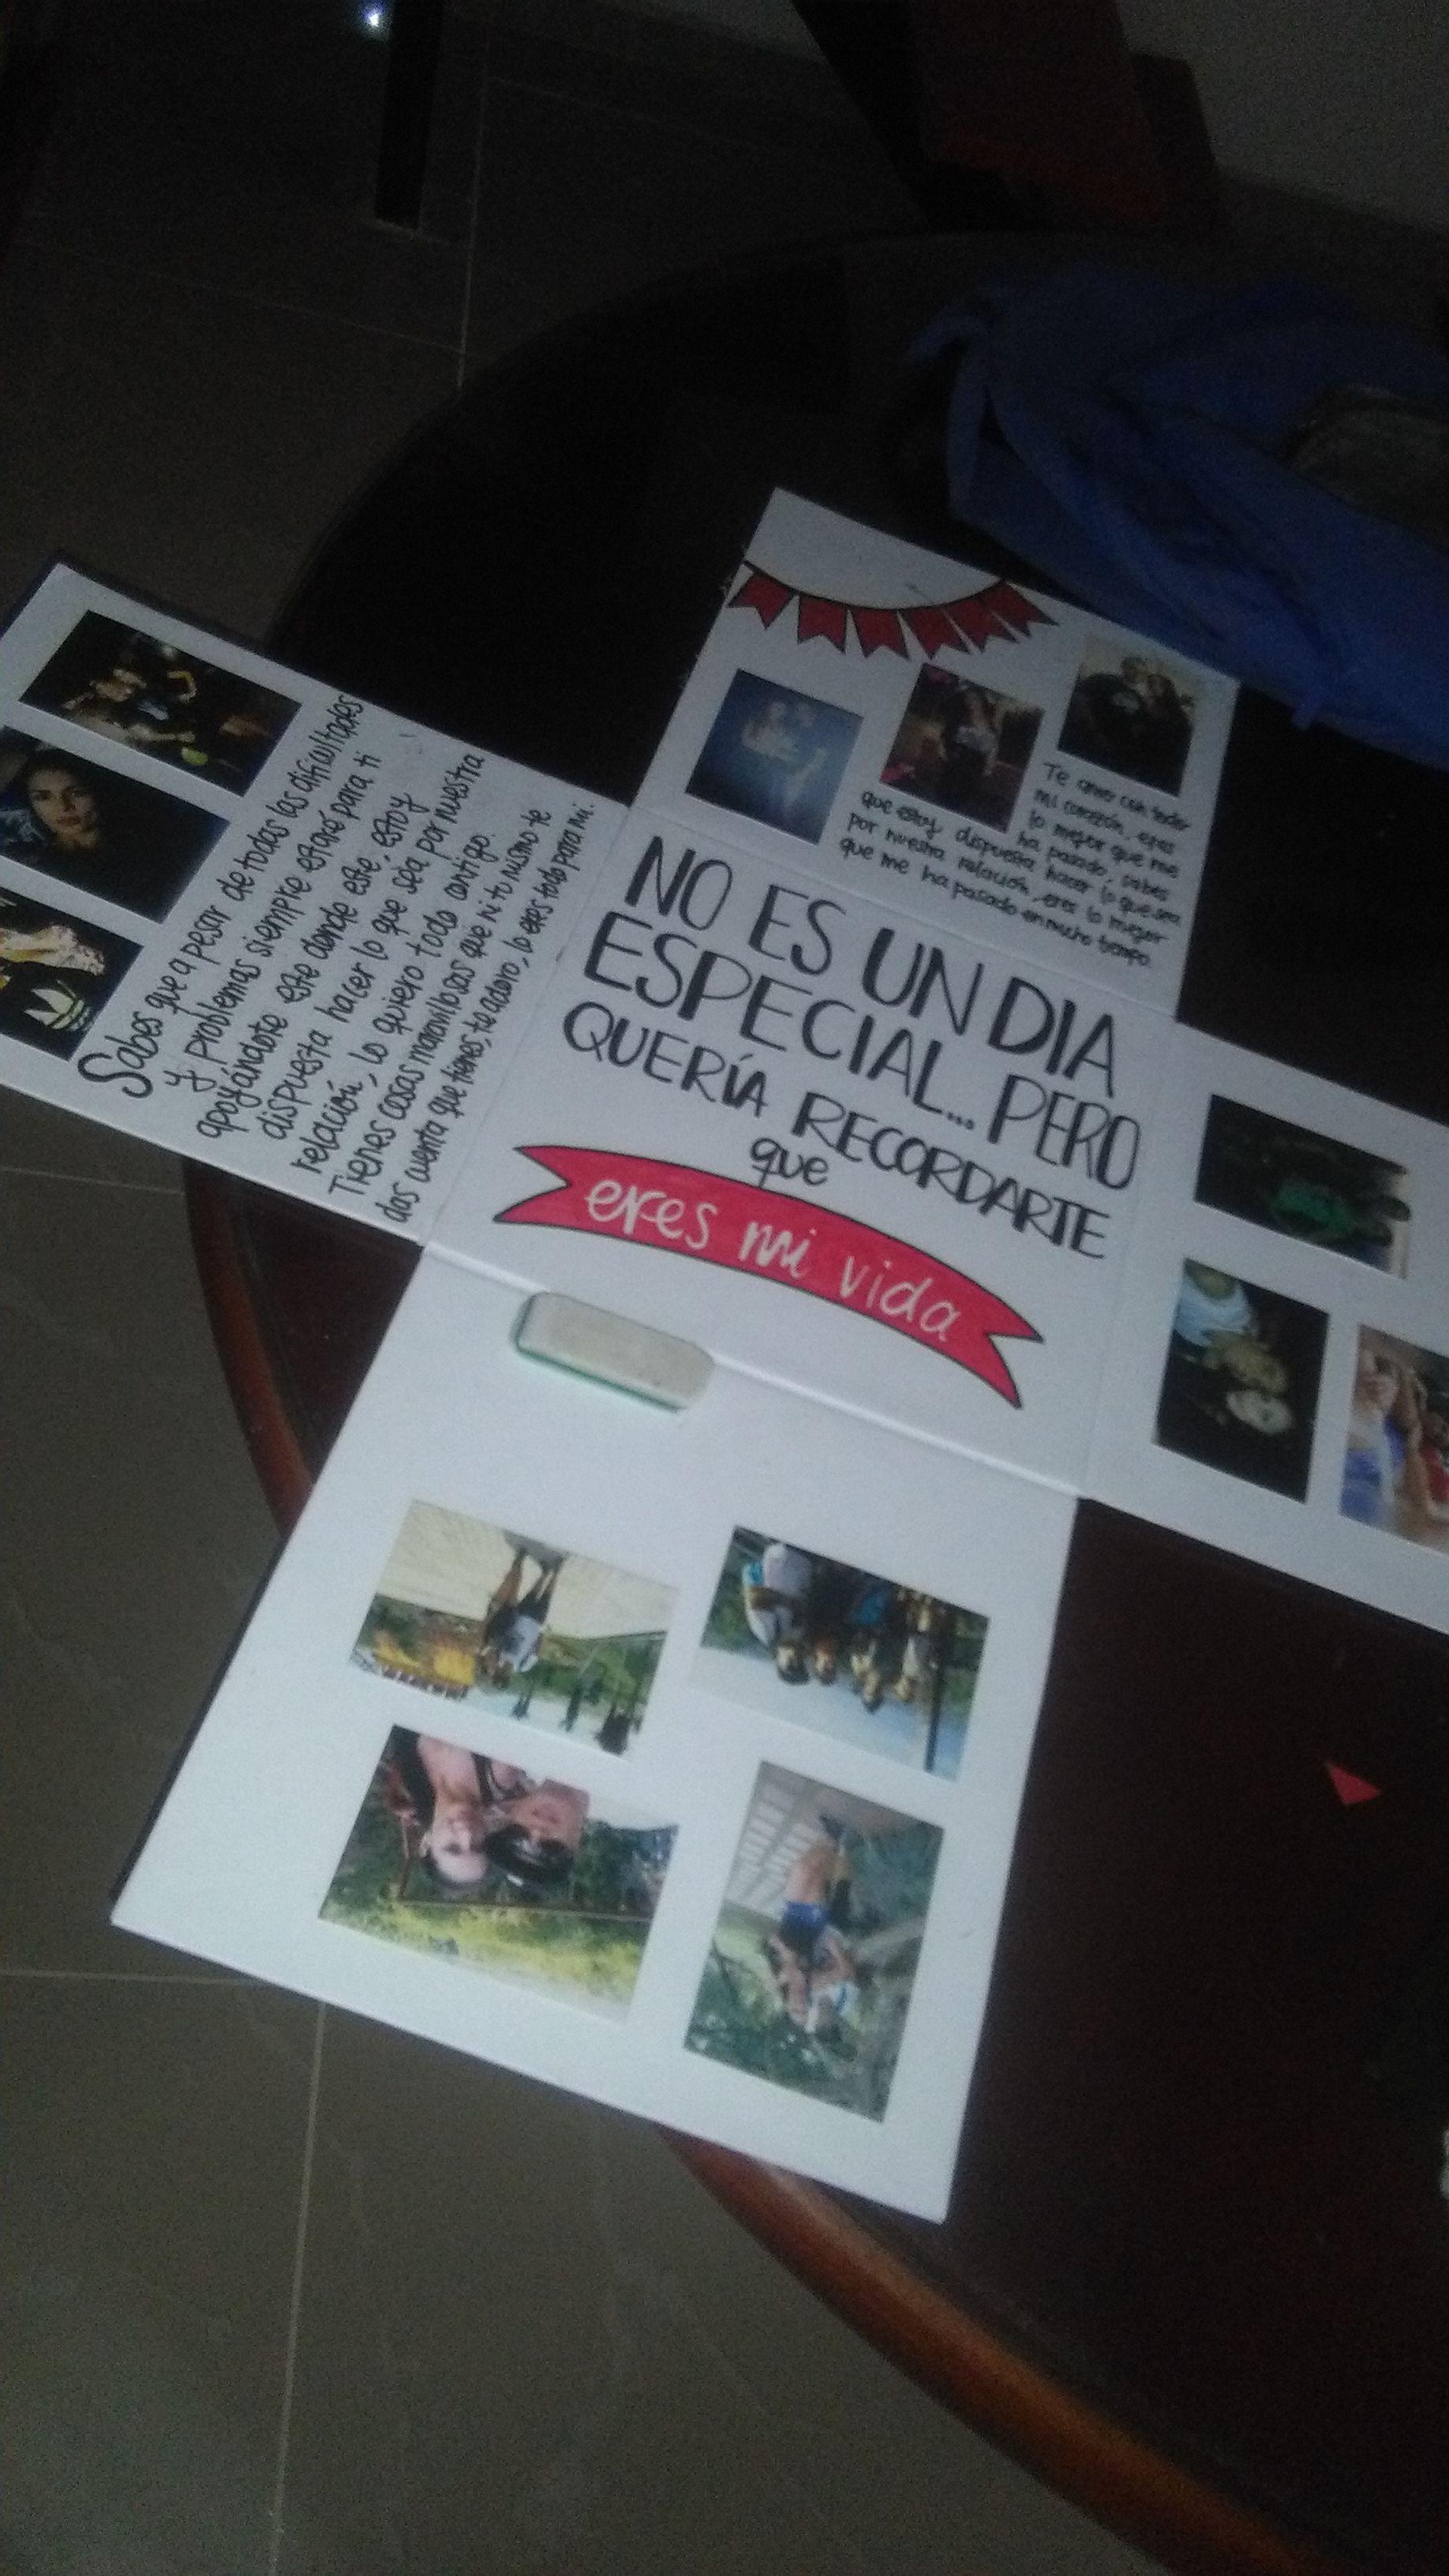 Pin De Oriana Vasquez En Oriana Regalos De Cumpleaños Creativos Regalos Creativos Regalos Creativos Para Novio